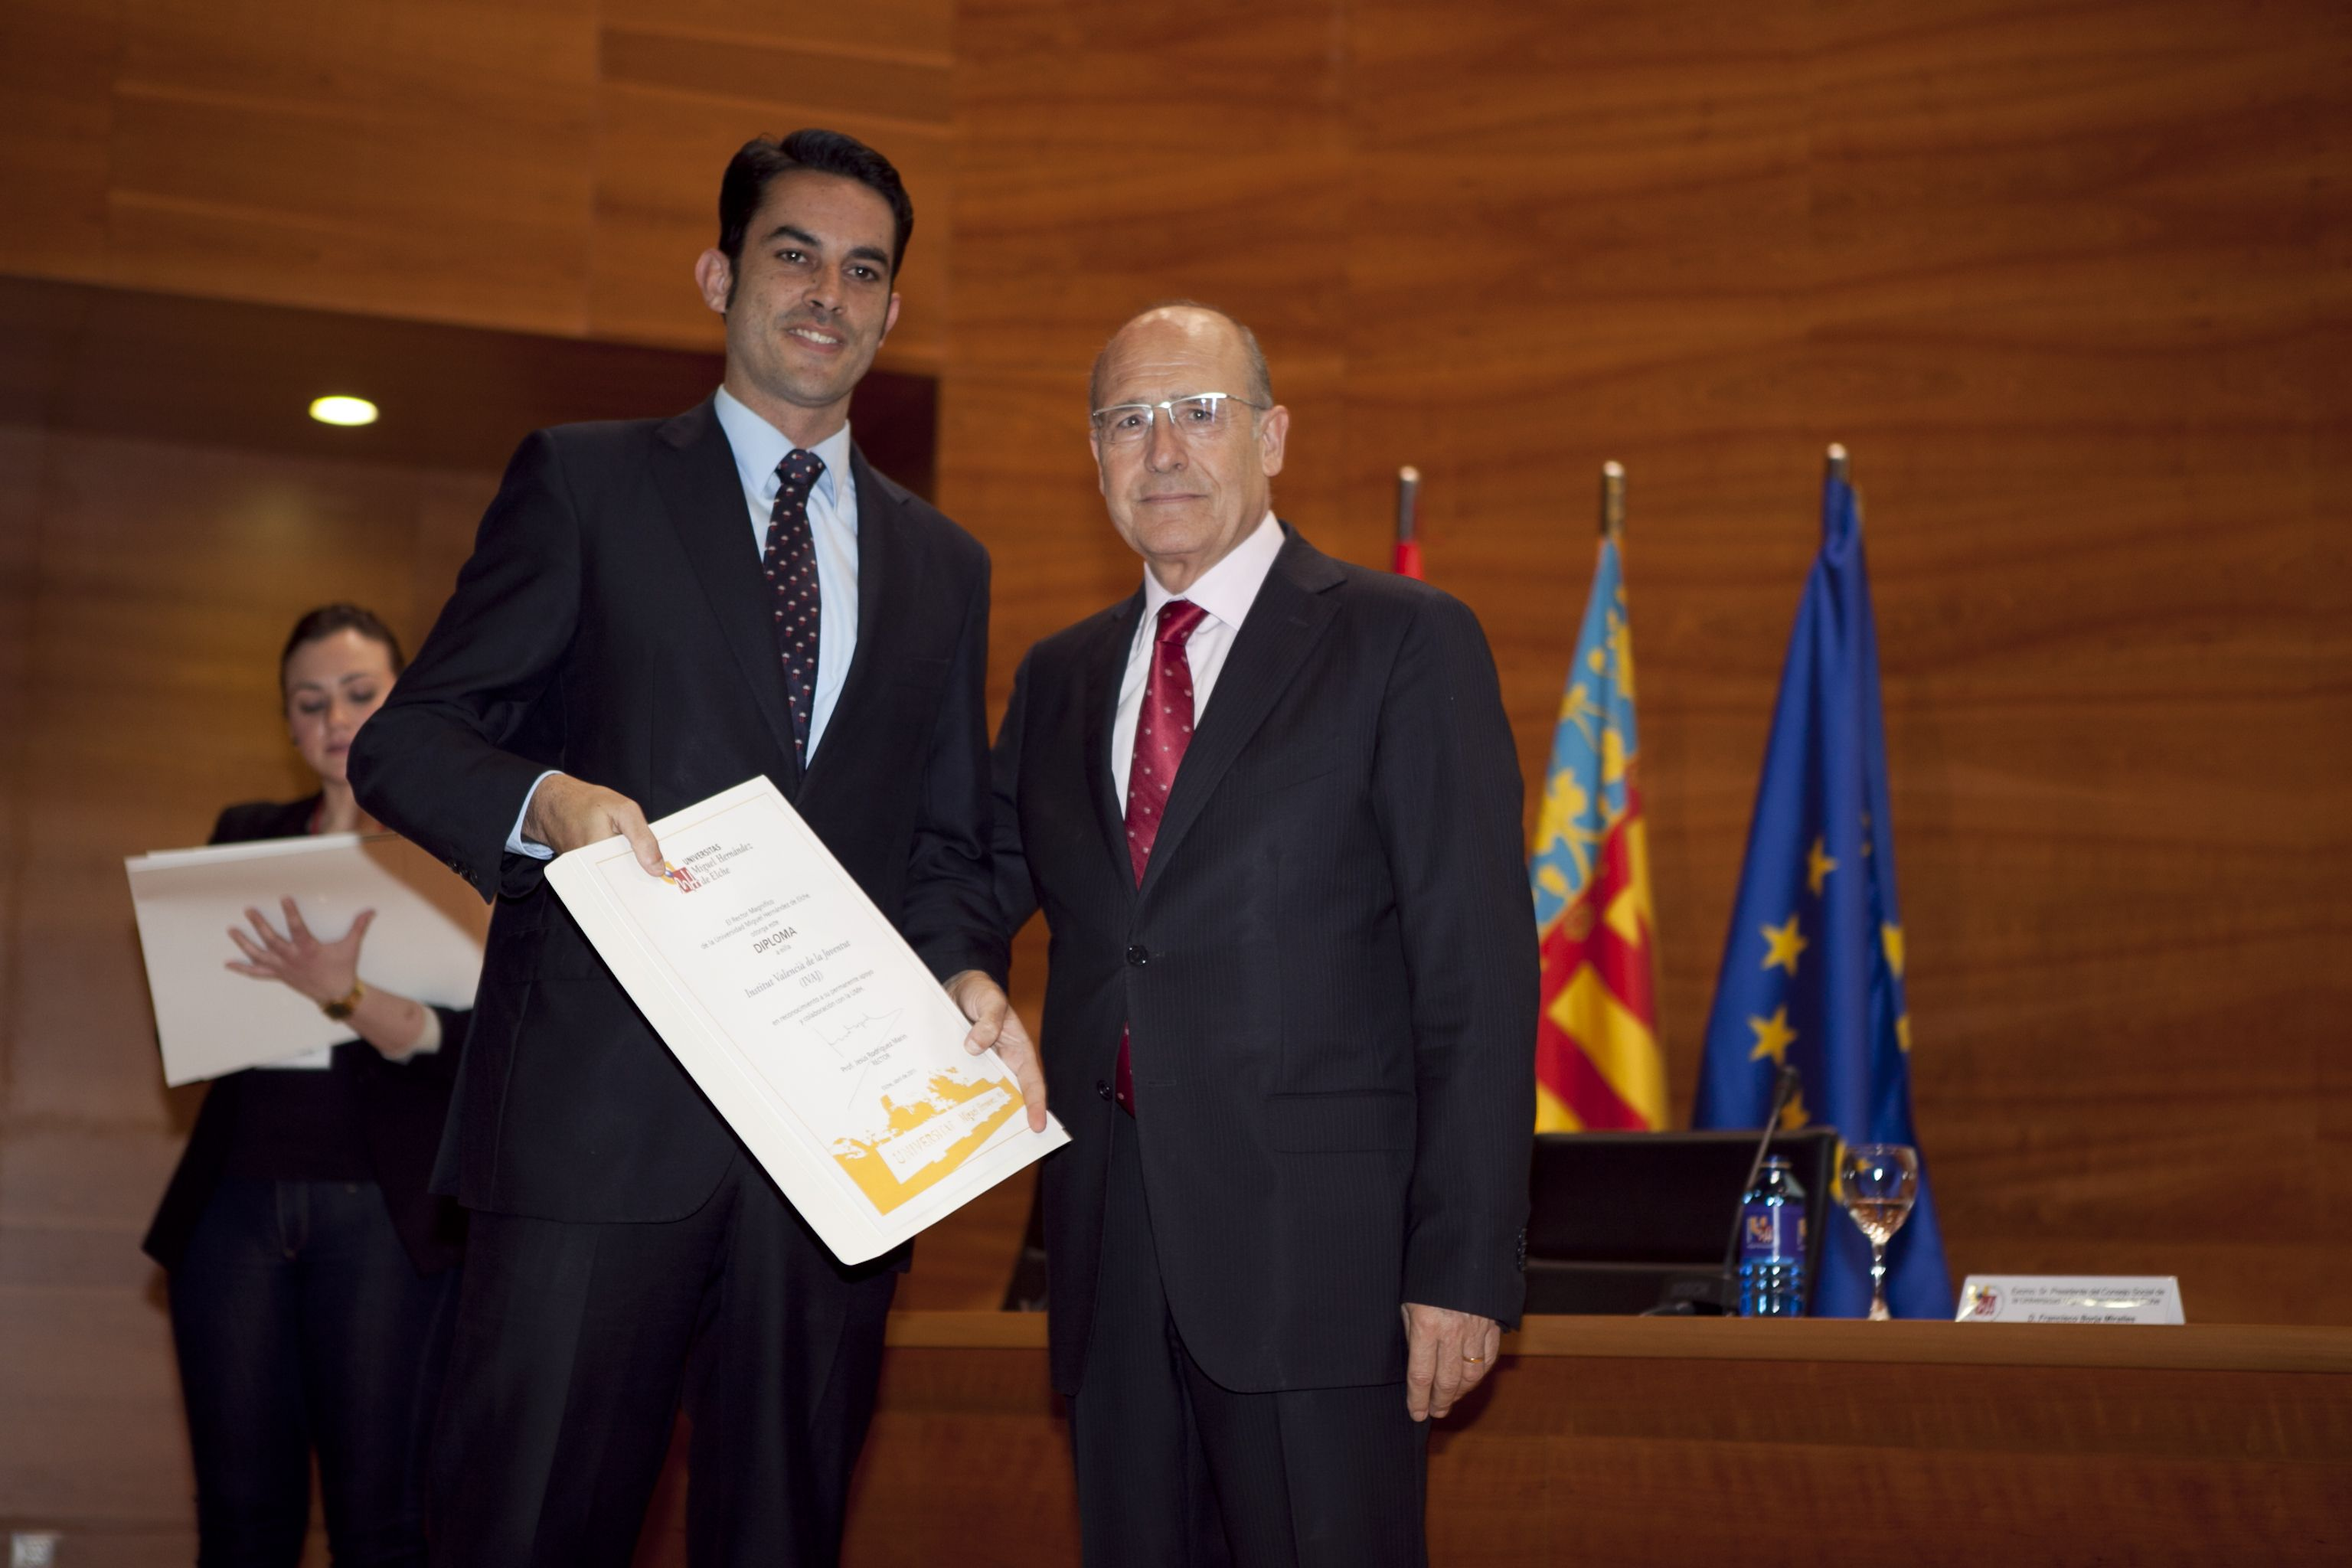 umh-diplomas-rector_mg_6635.jpg